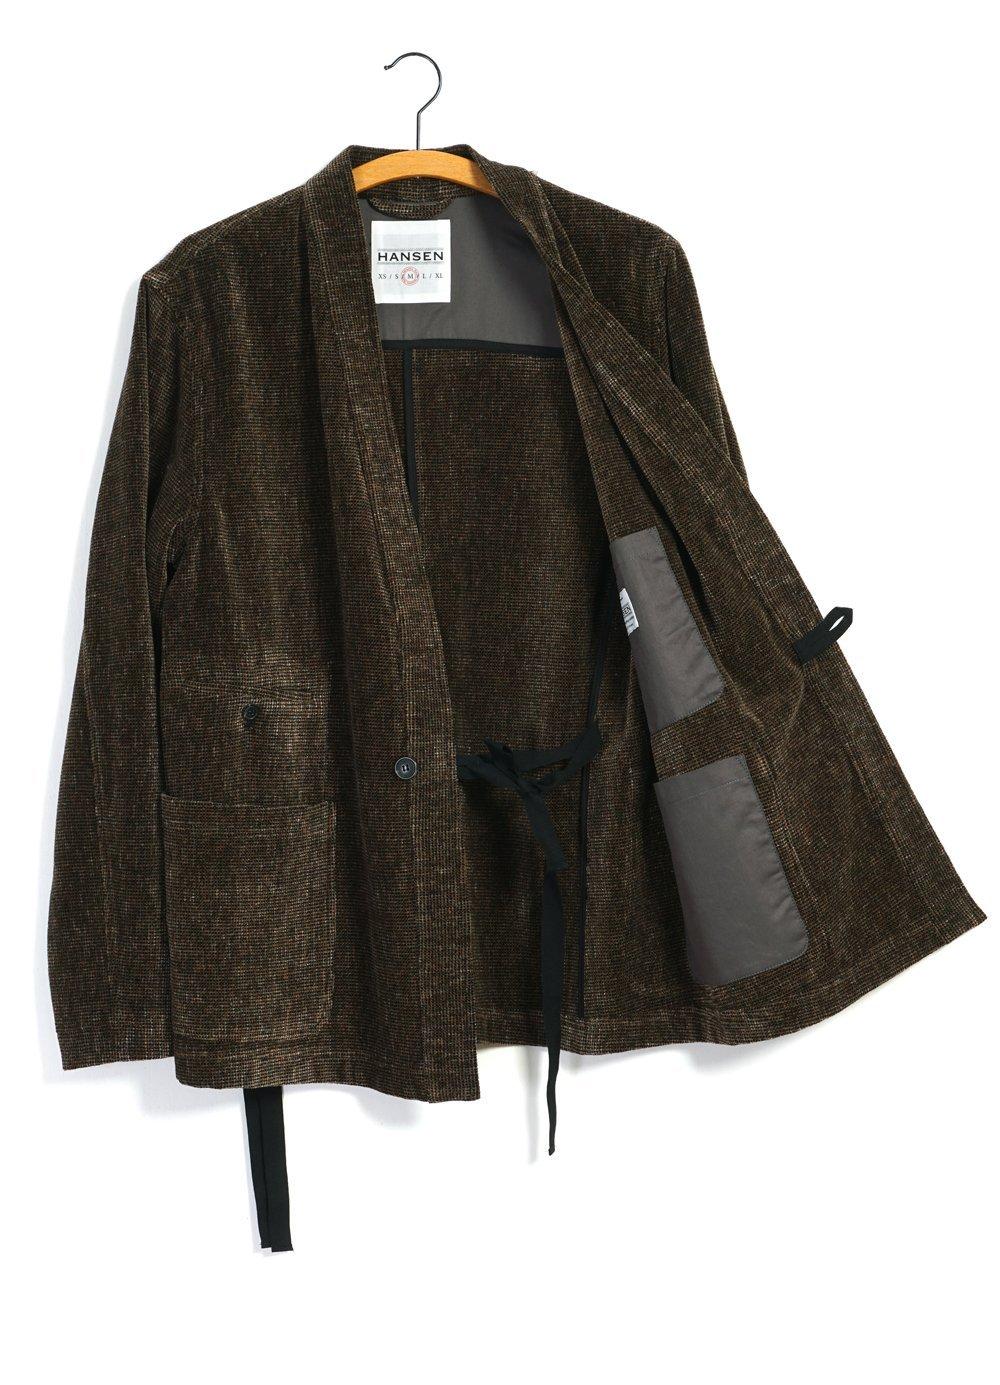 Hansen Garments FOLKE   Scarecrow's Jacket   amadeus